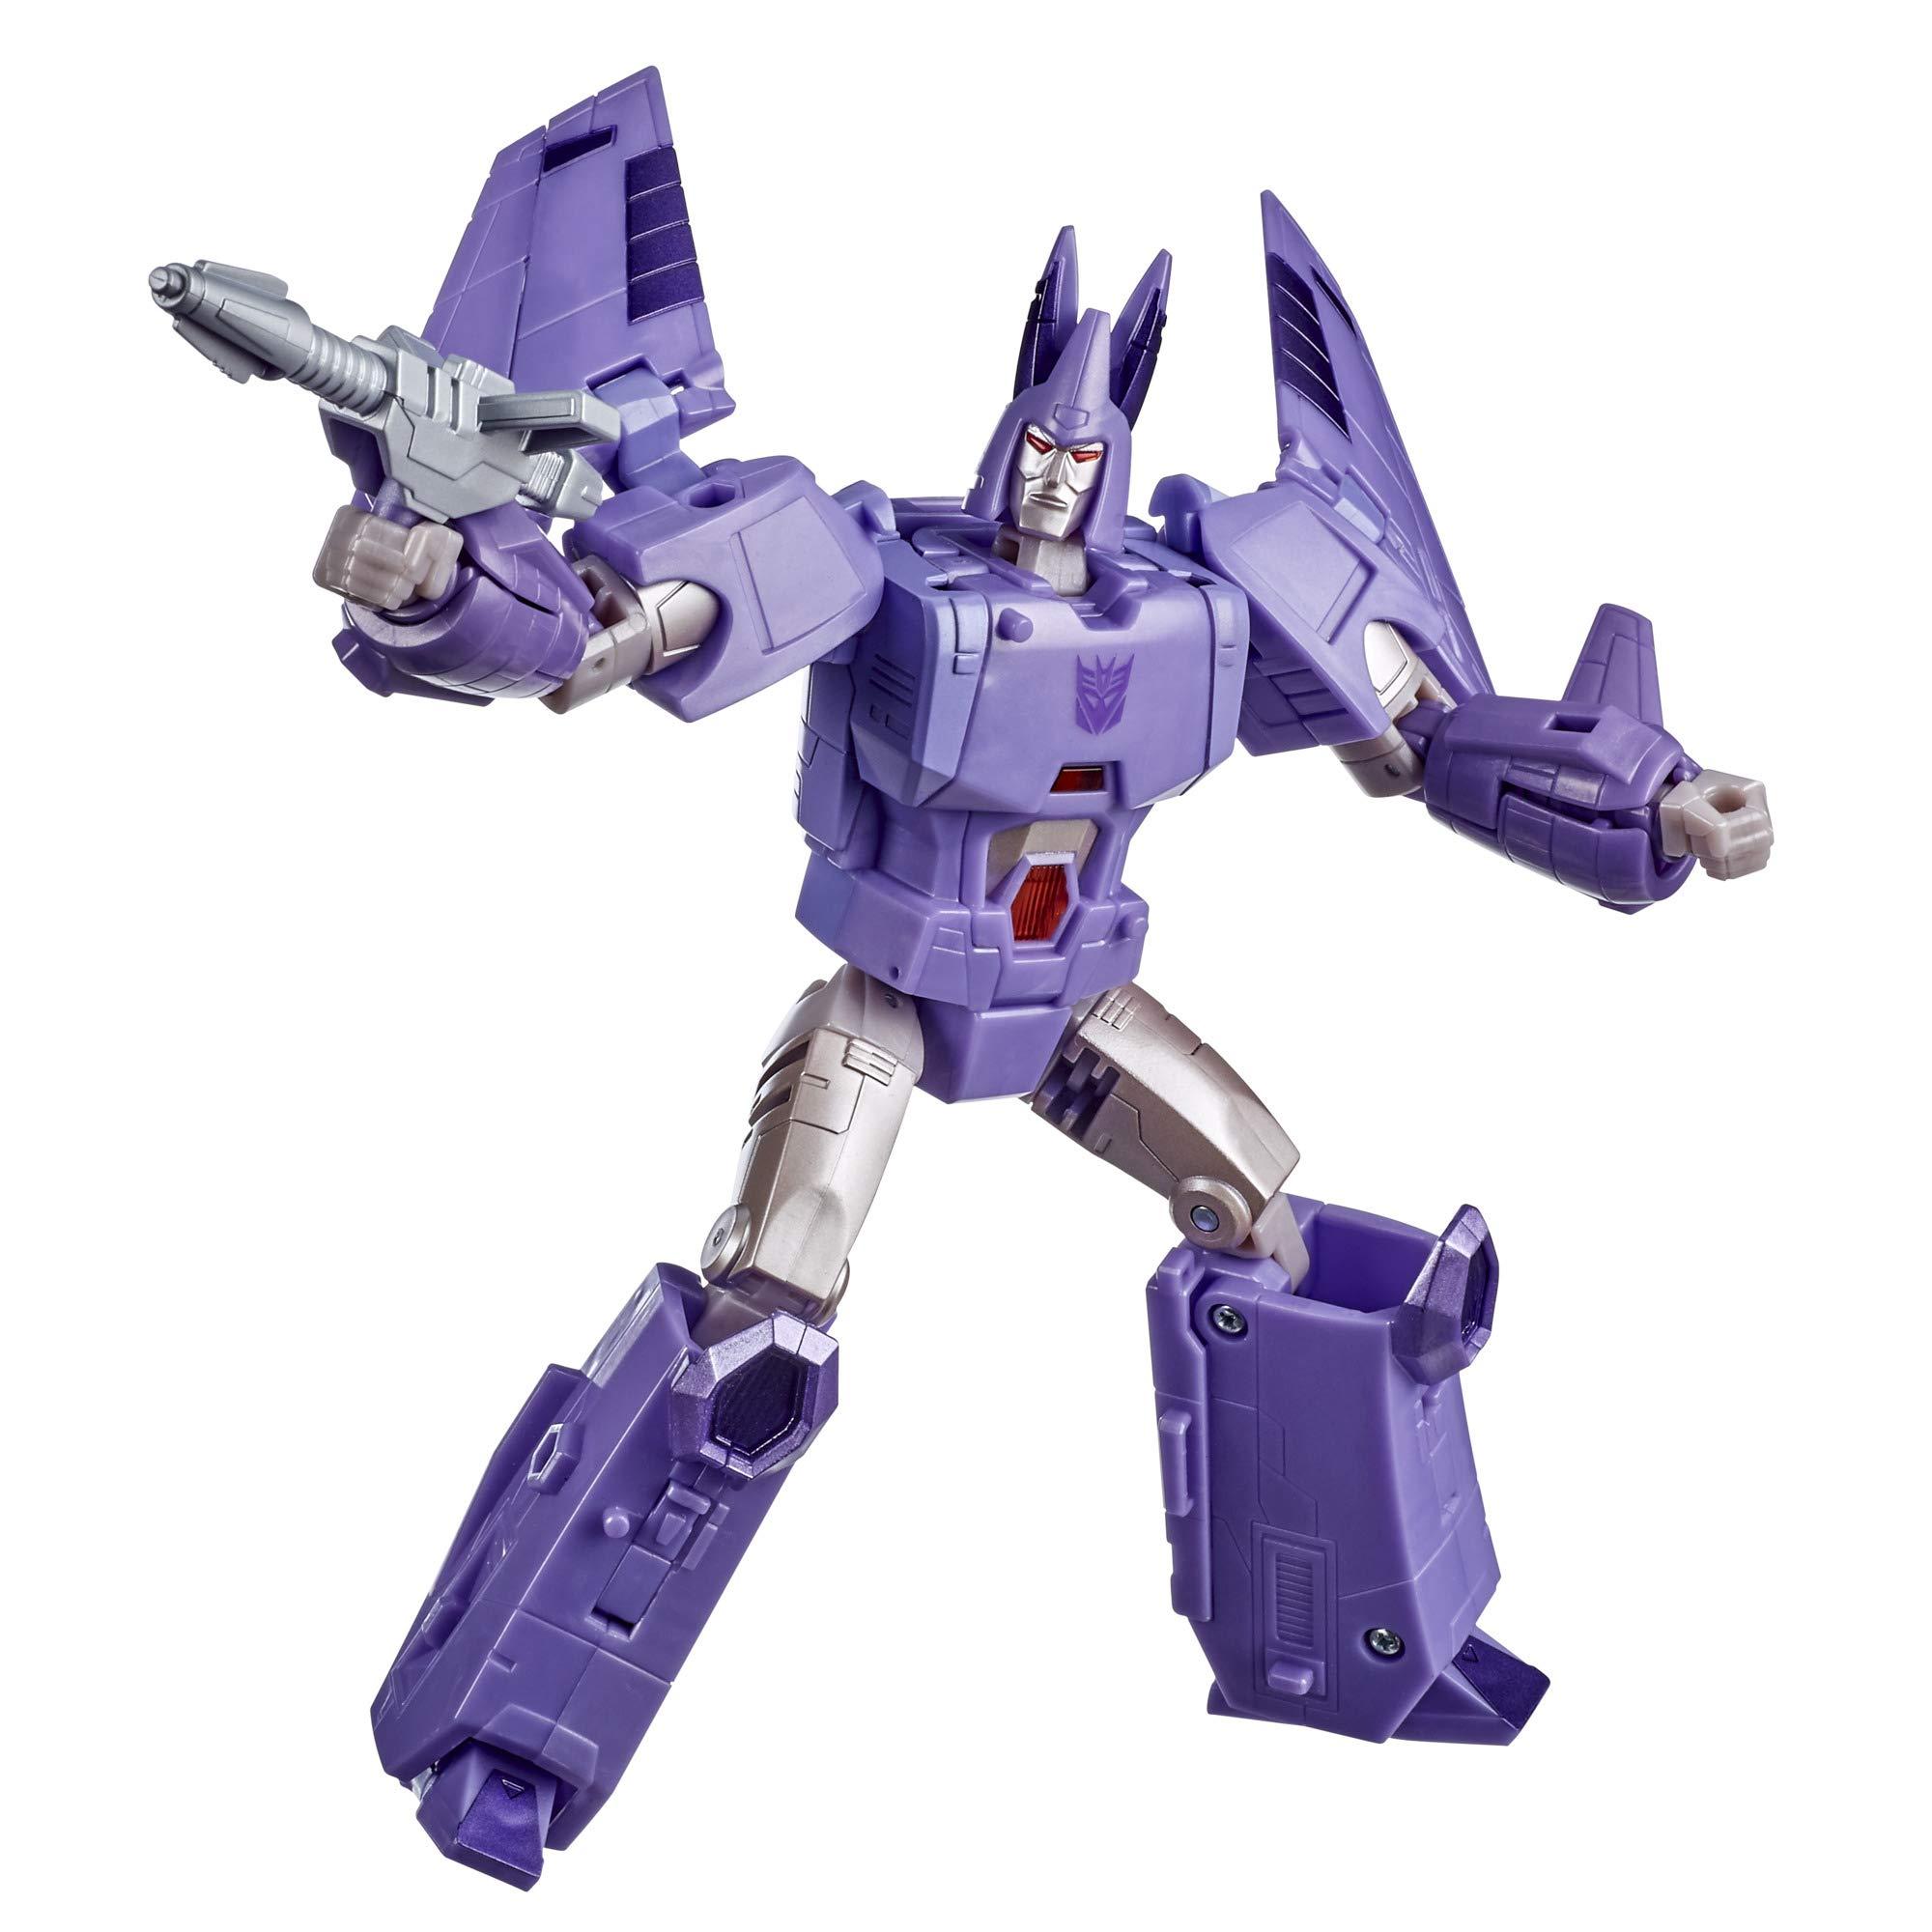 Transformers War for Cybertron: Kingdom - Cyclonus - $29.99